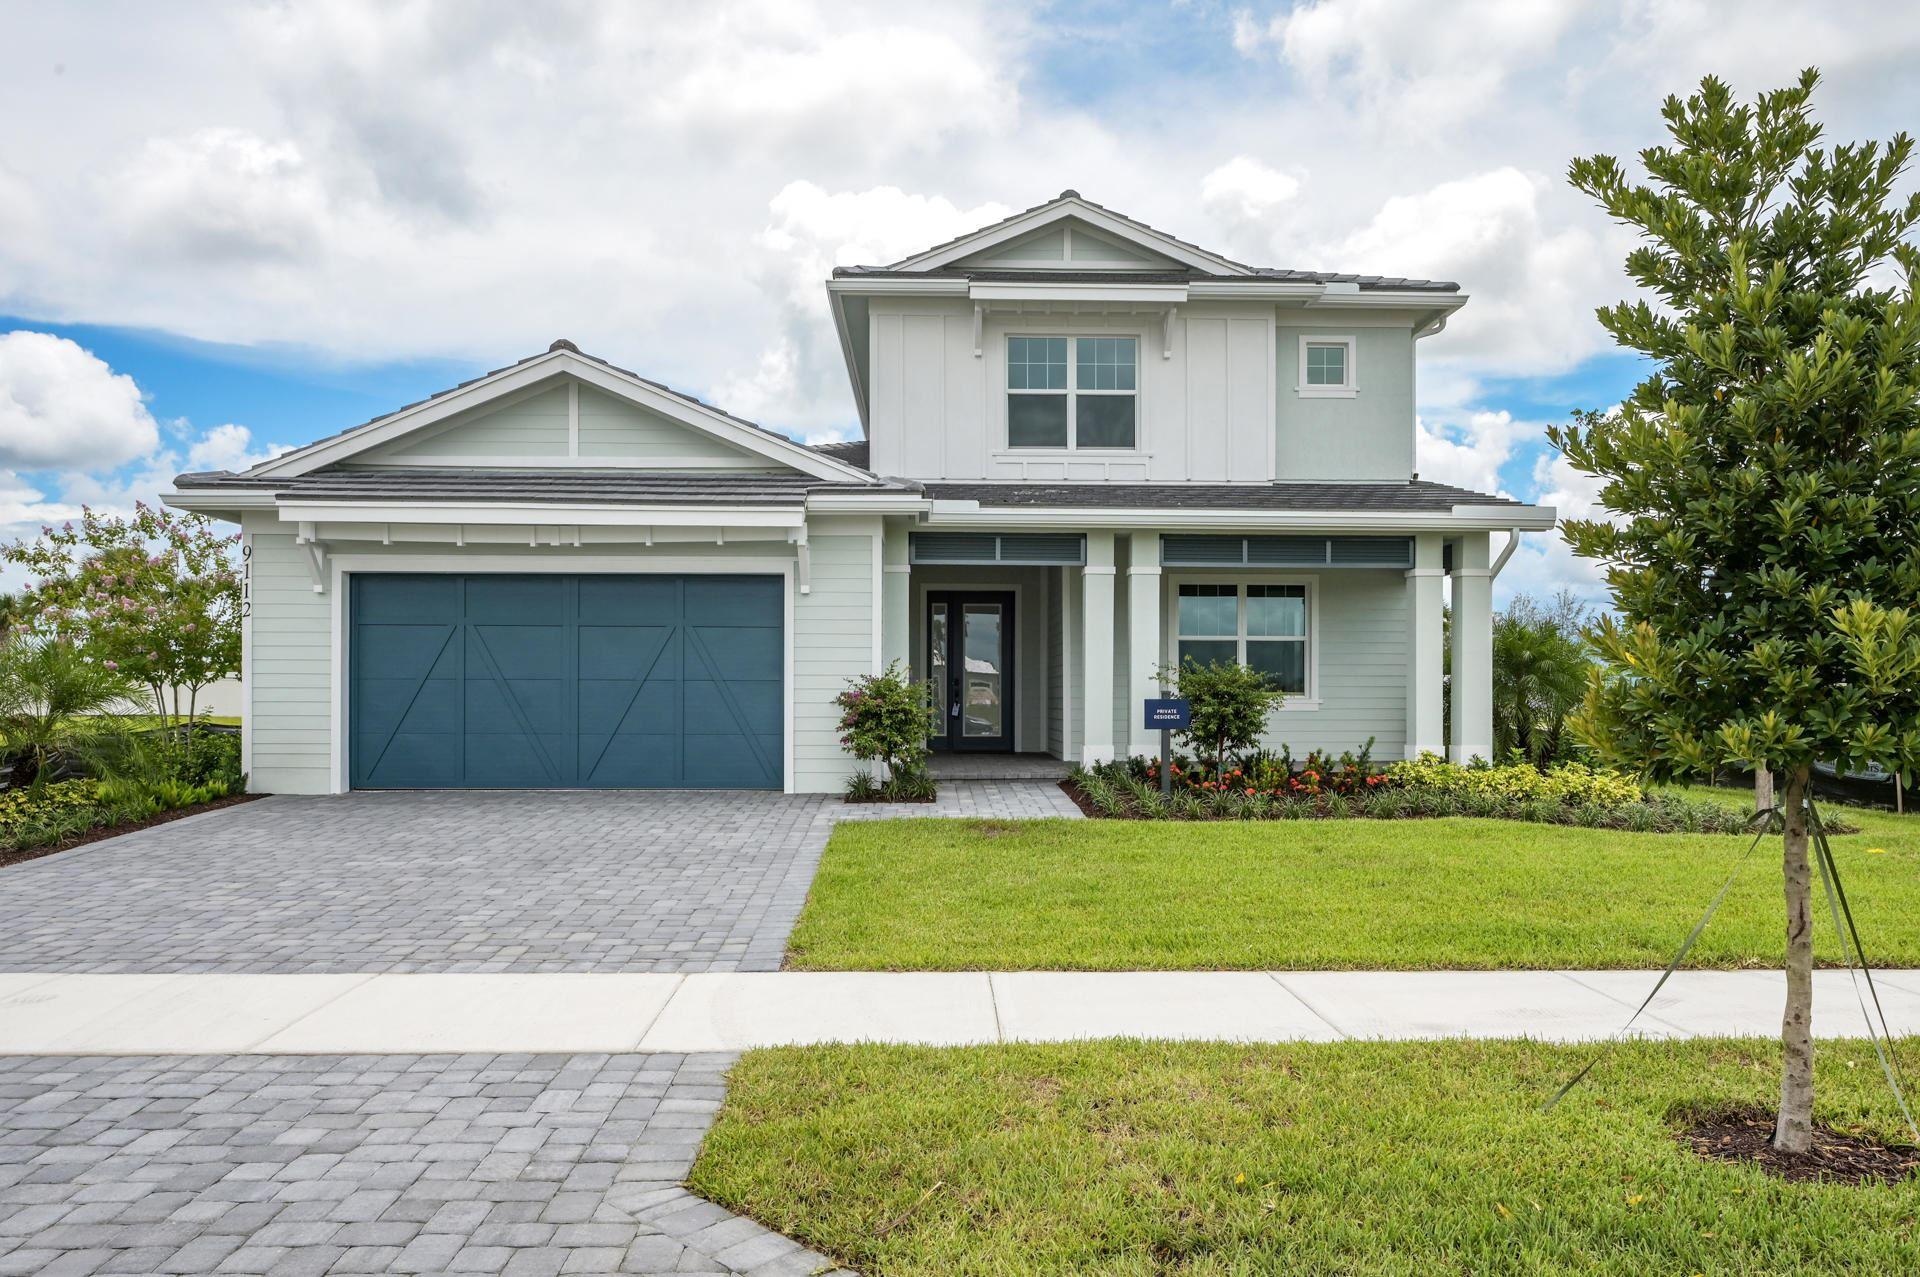 Photo of 9112 Crestview Circle, Palm Beach Gardens, FL 33412 (MLS # RX-10728202)